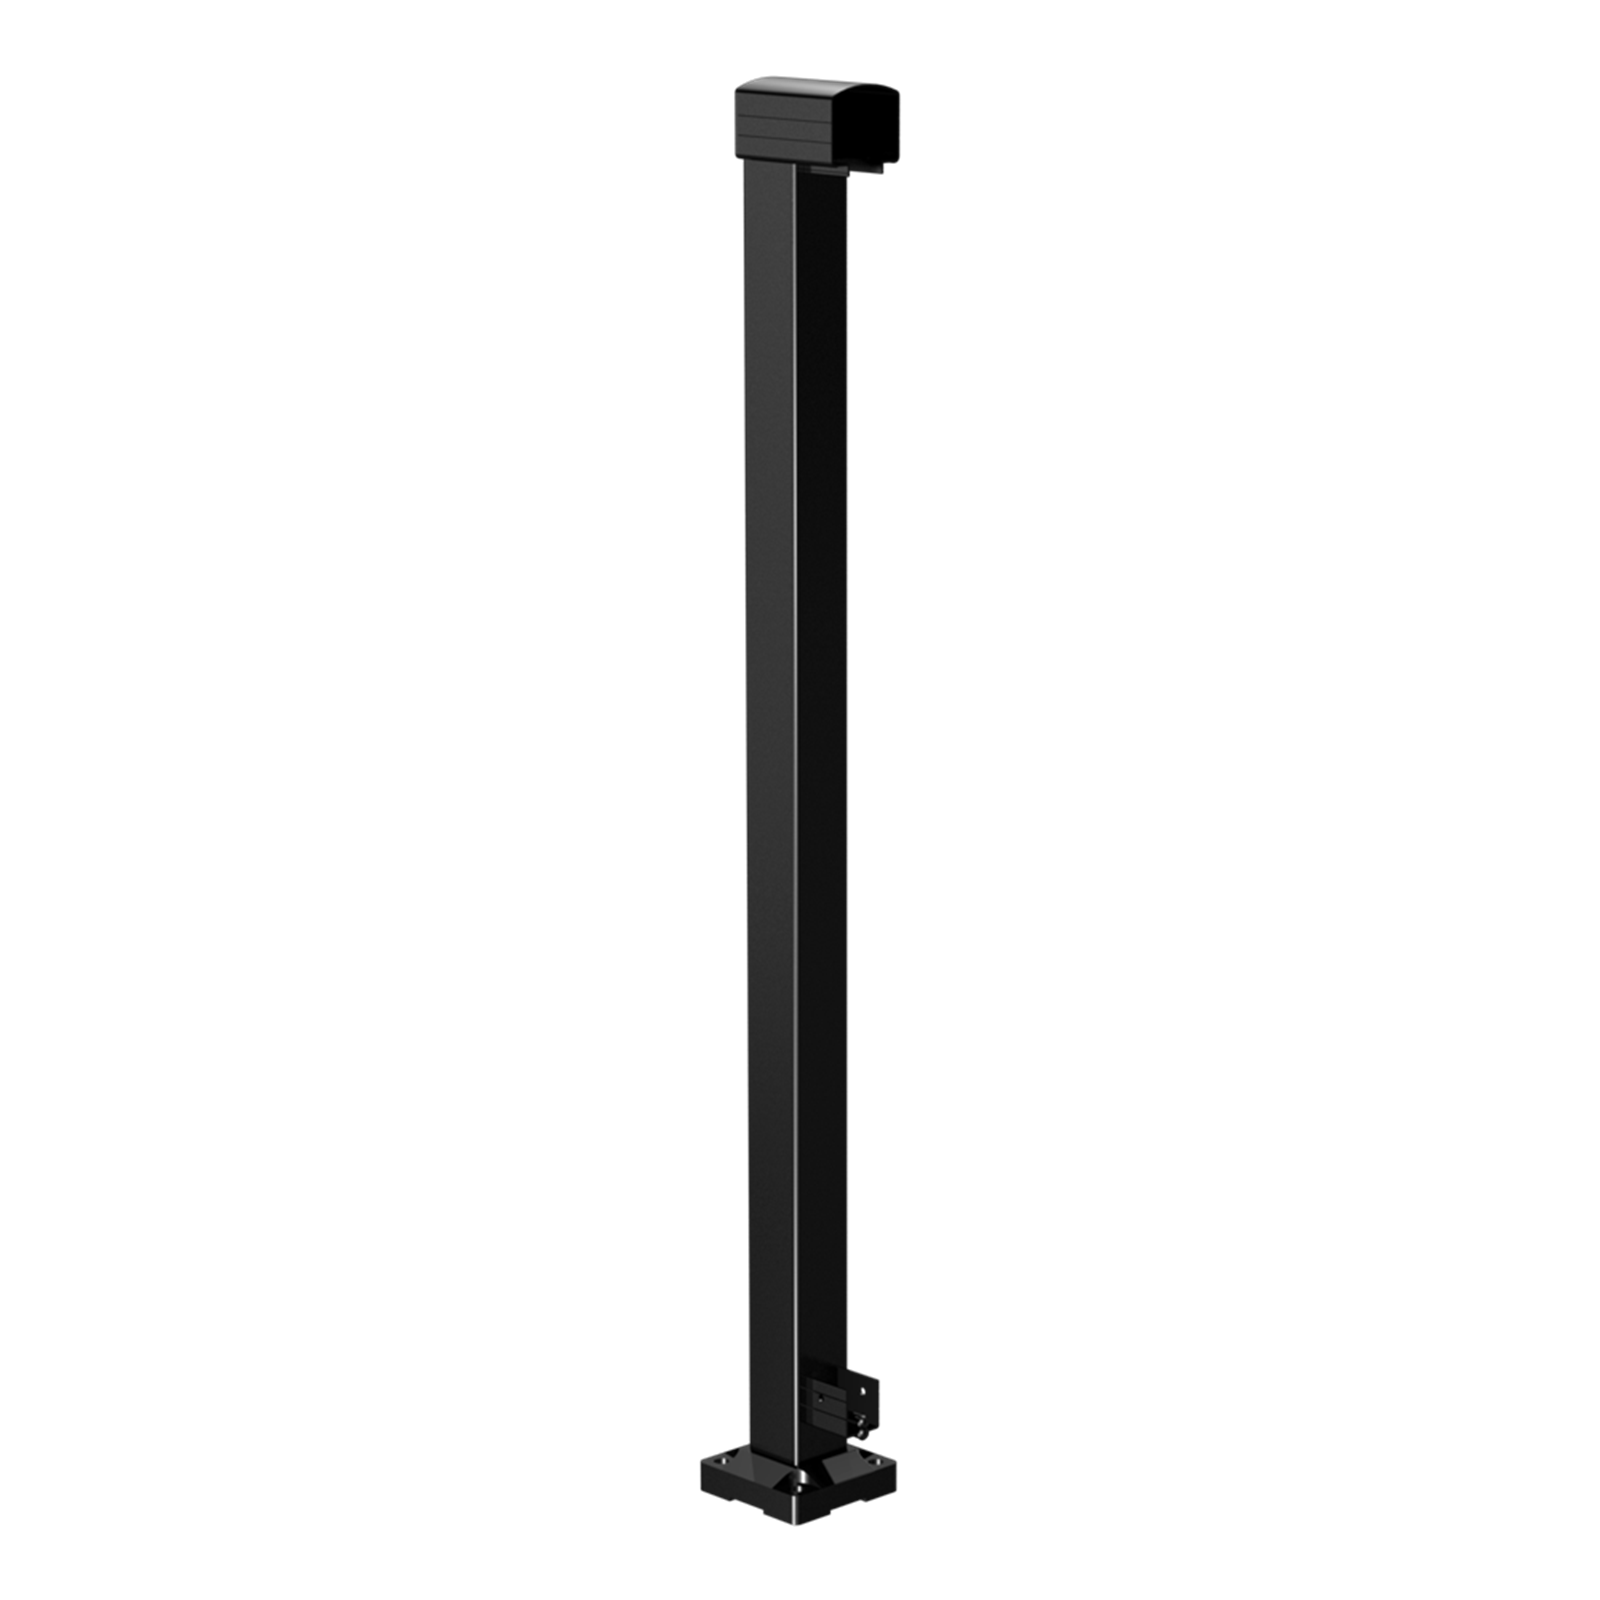 Peak Products 1000mm Black Aluminium Balustrade End Post